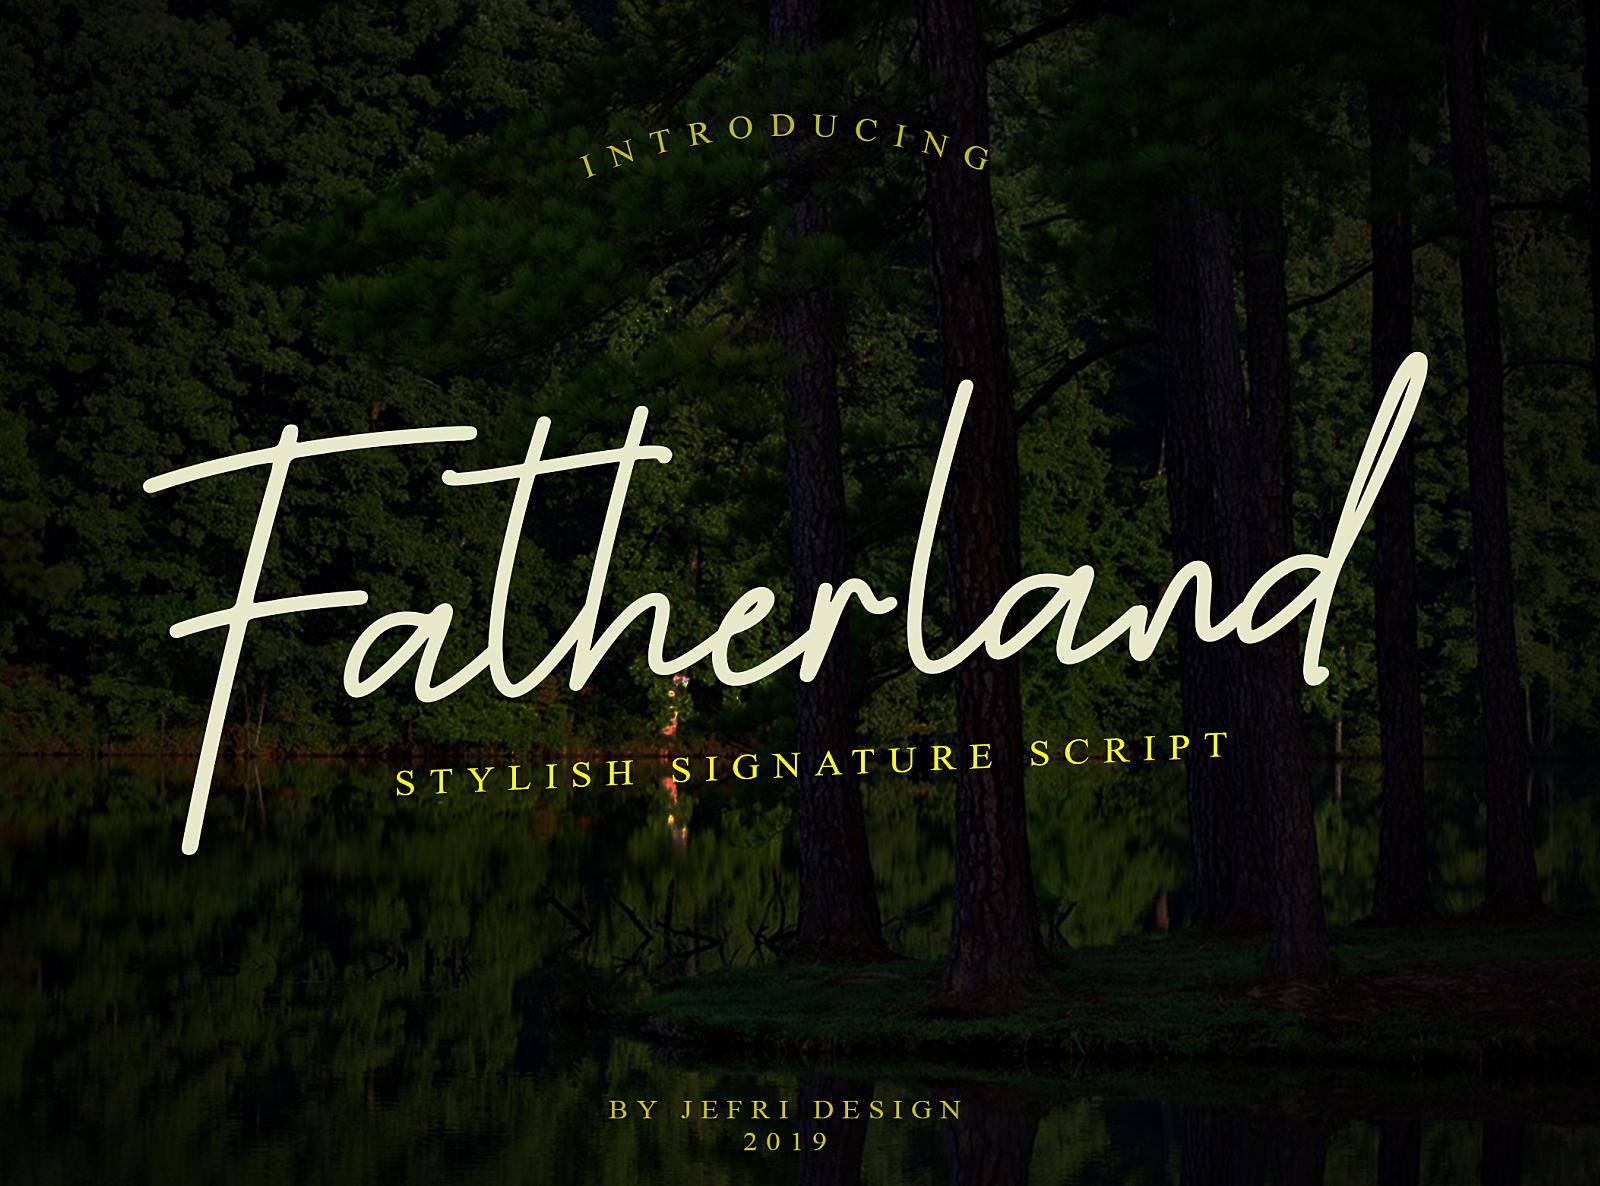 Fatherland Script Signature Font by Jefri Dwi Alfatah on Dribbble